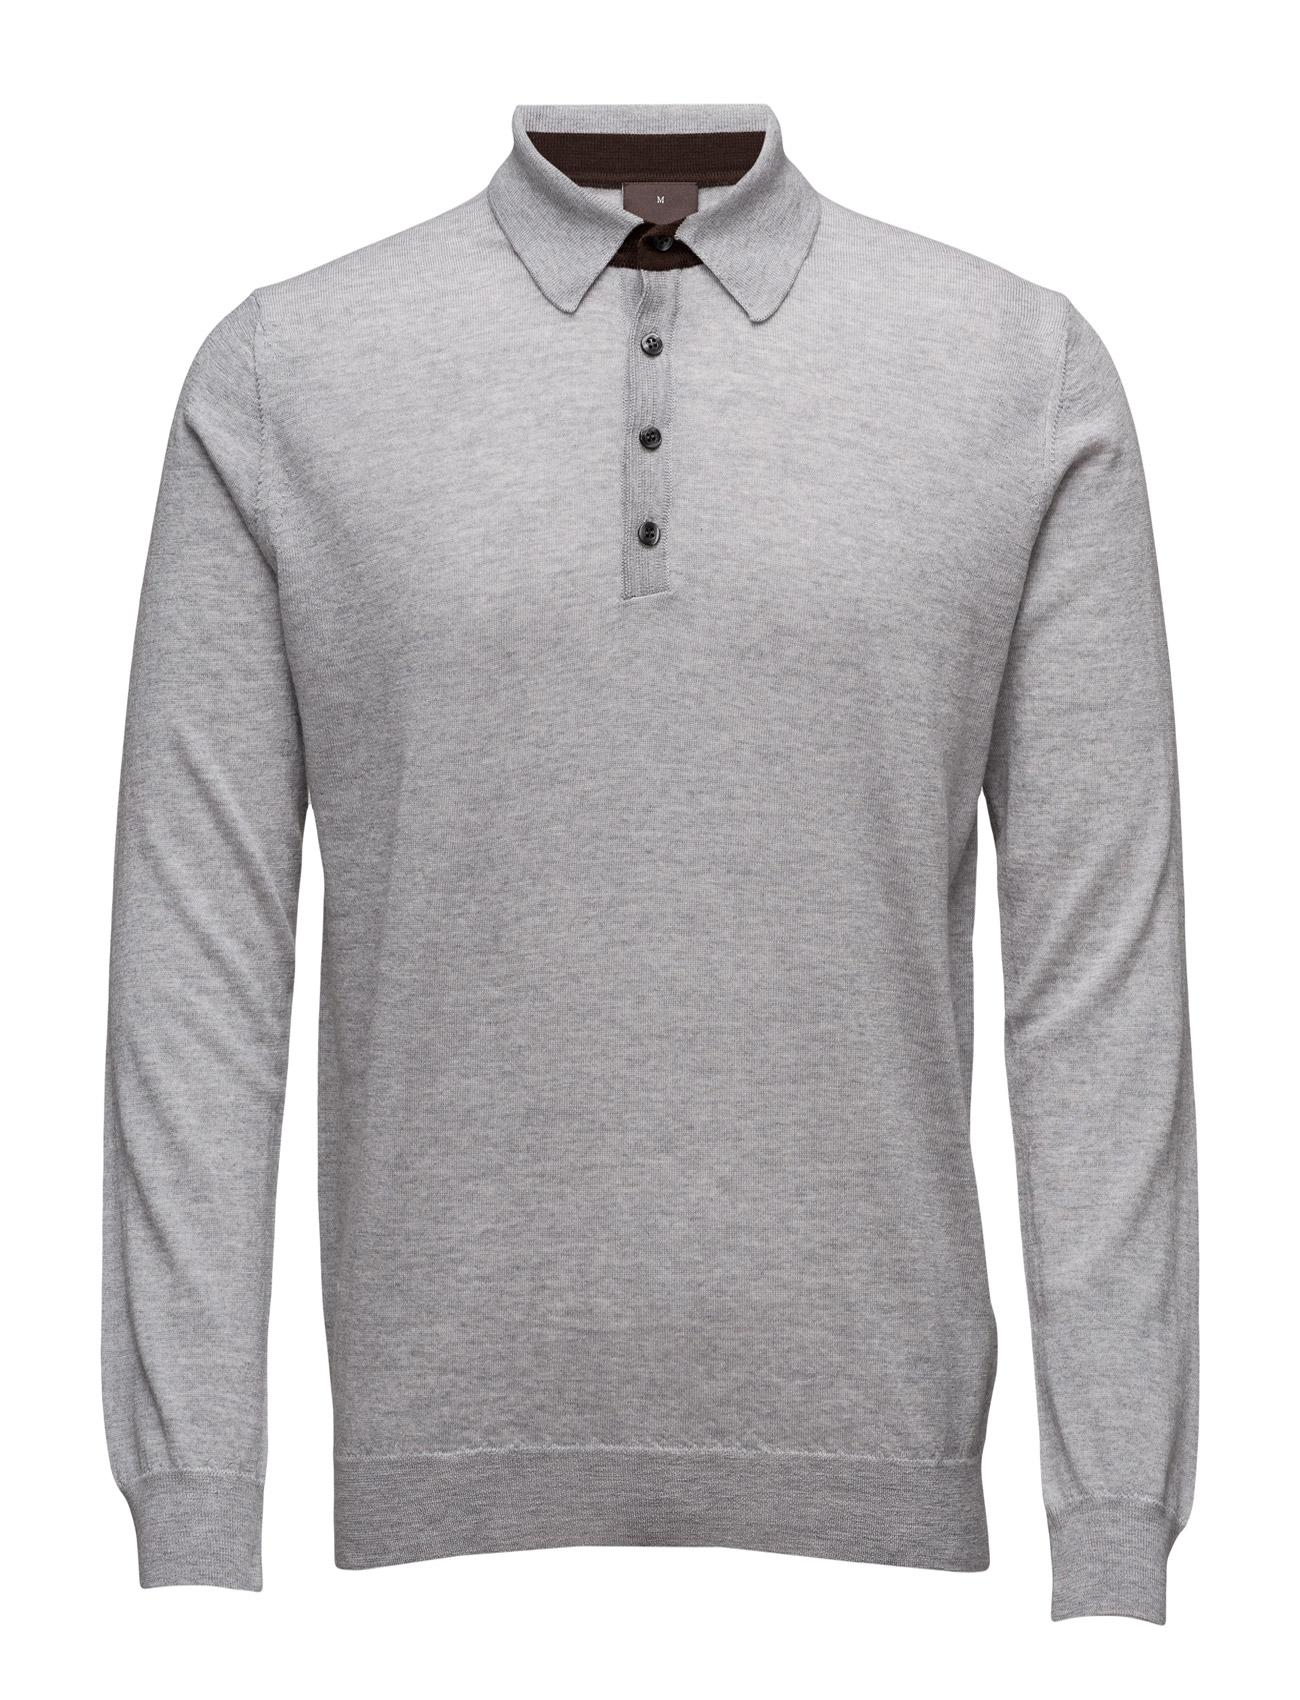 Agustin L/S Poloshirt Oscar Jacobson Længærmede polo t-shirts til Herrer i Grå